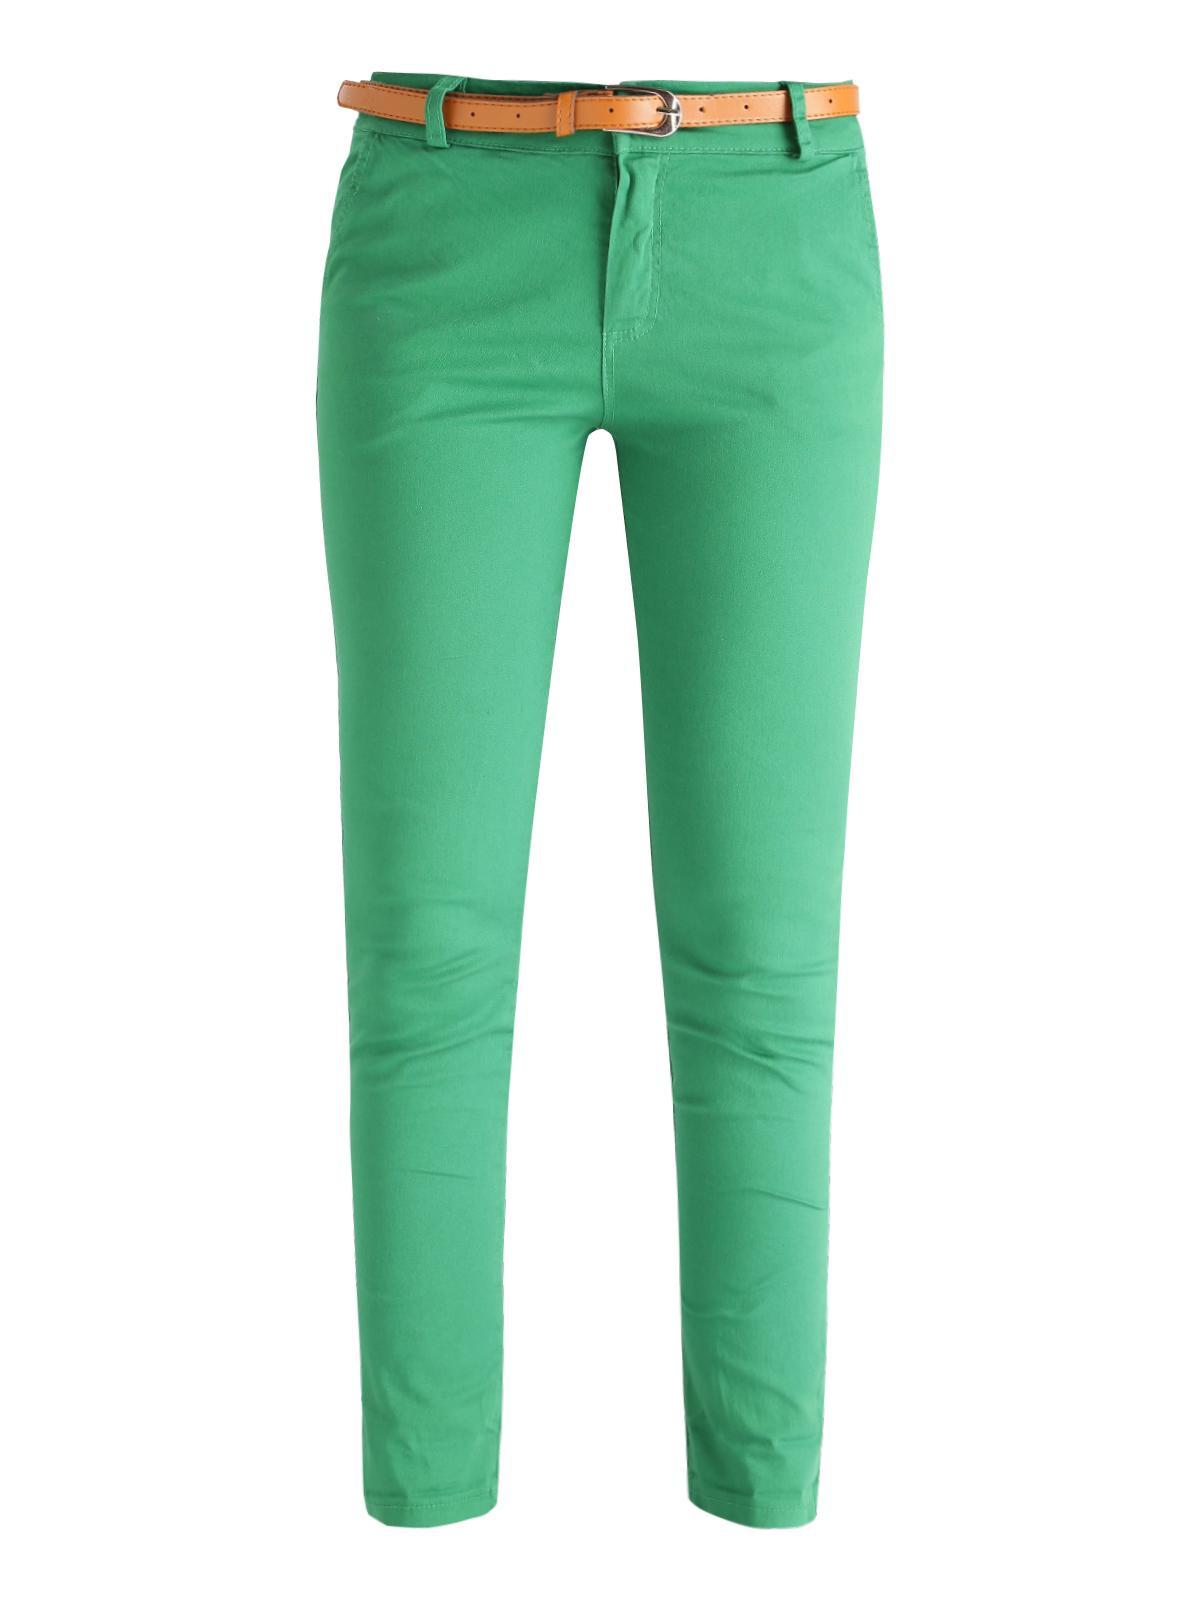 9b8841abfa1c Pantalones de algodón con cinturón mujer | MecShopping